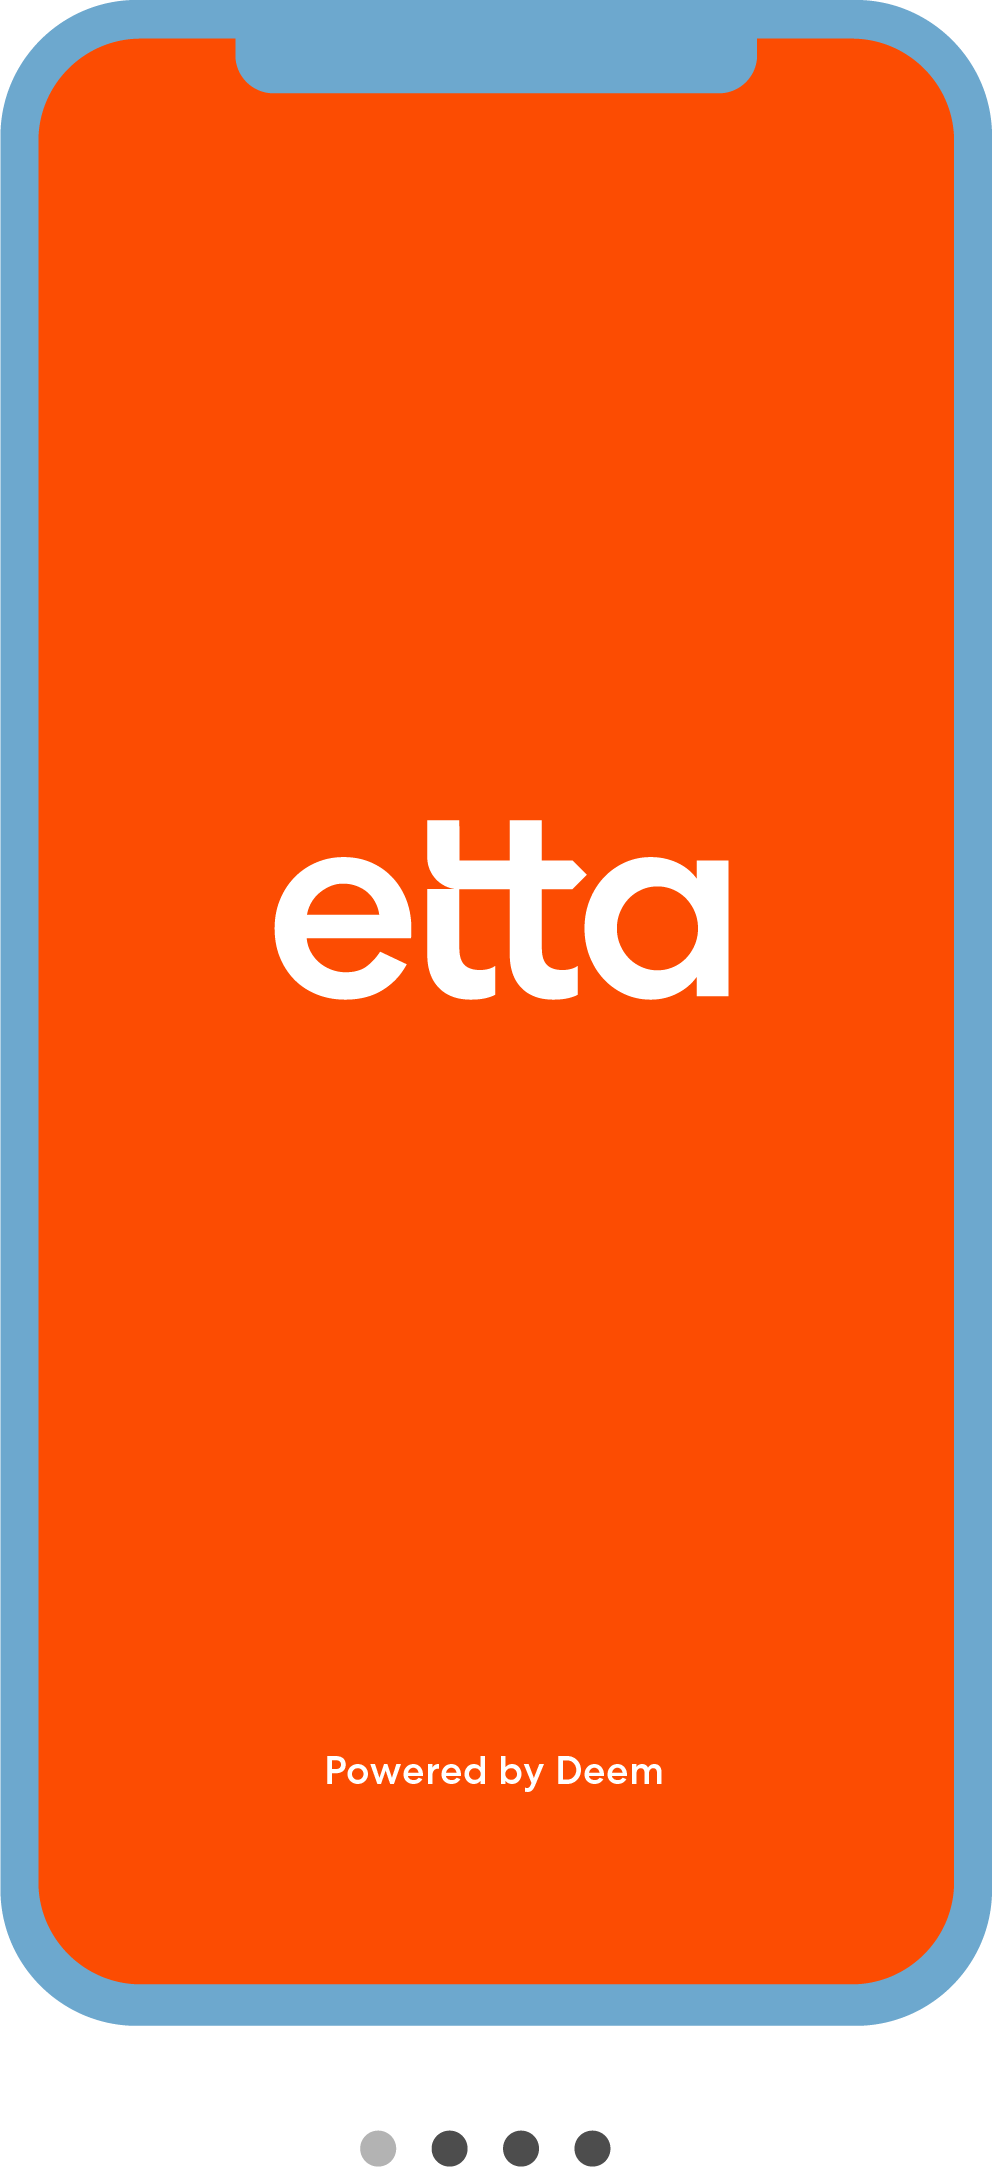 ETTA on mobile phone